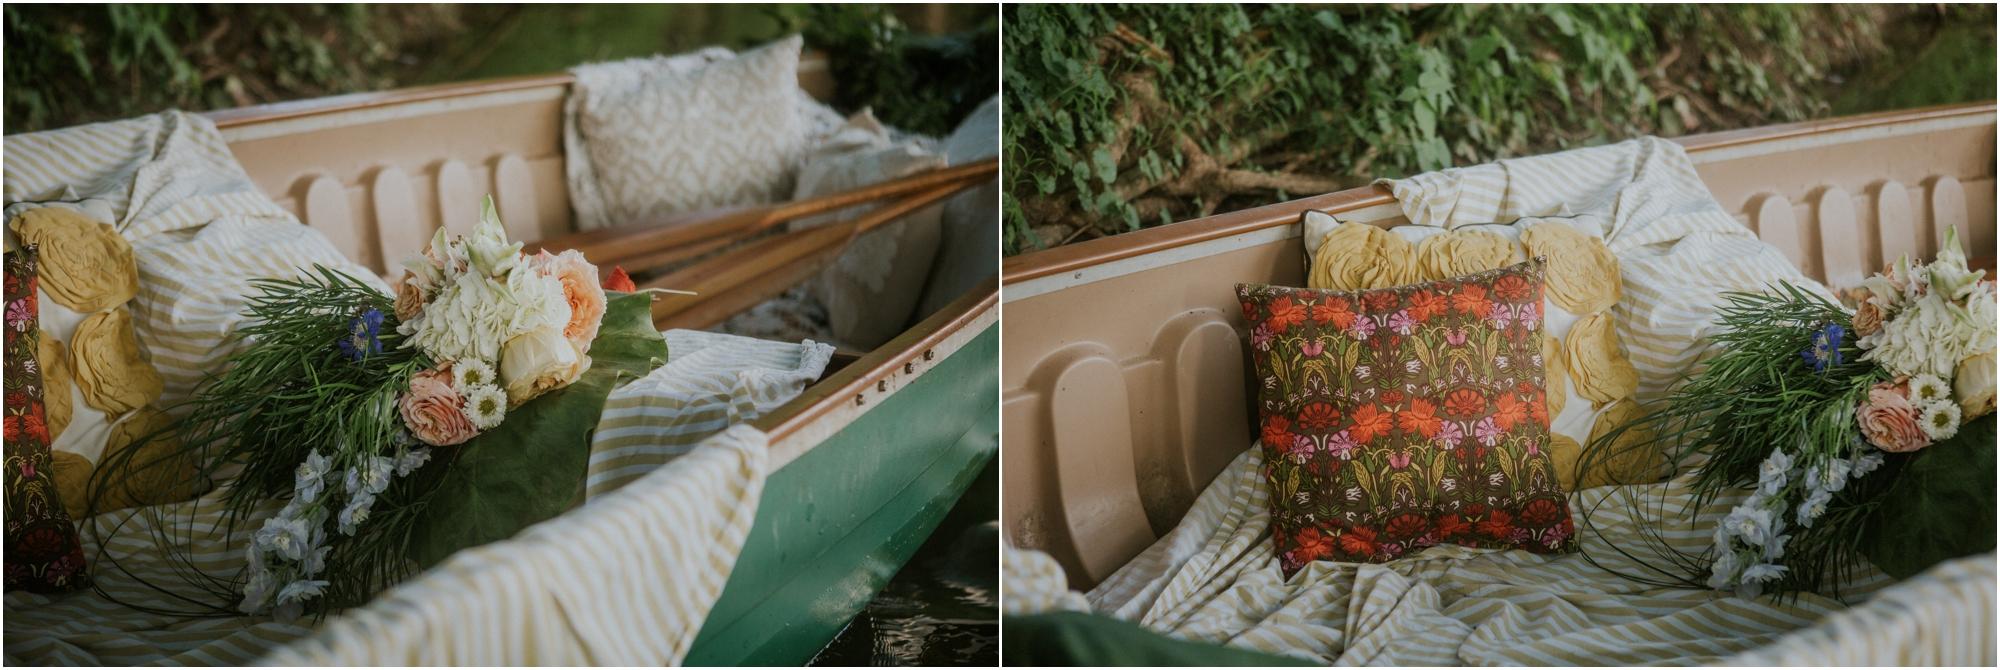 homestead-on-the-holston-hiltons-virginia-bohemian-canoe-styled-shoot-northeast-tennessee-elopement-wild-free-spirit_0025.jpg